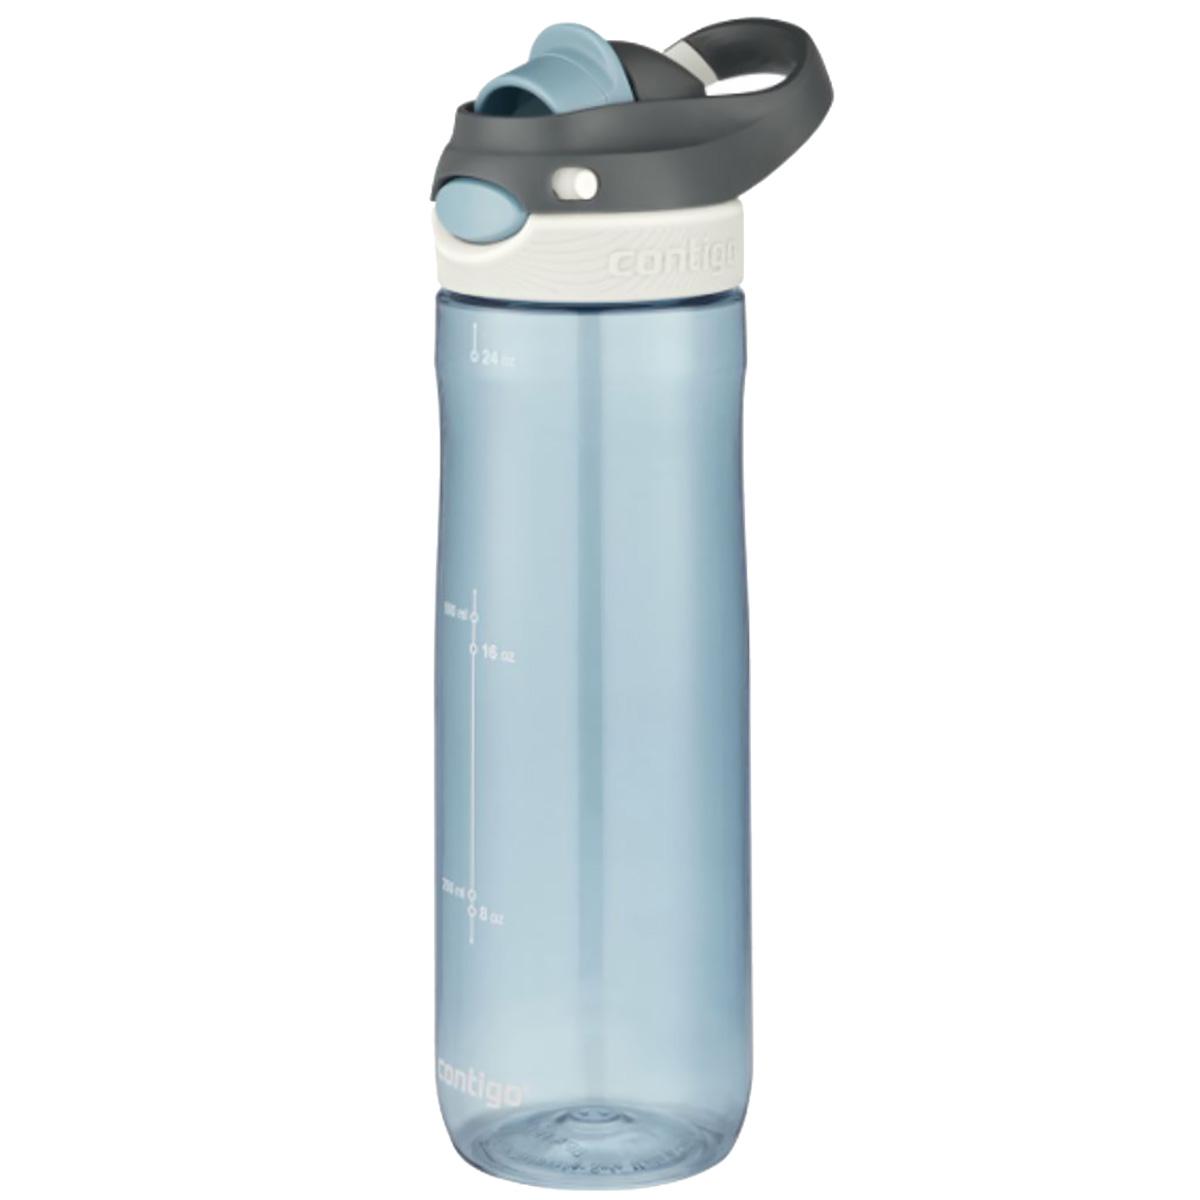 Contigo-24-oz-Chug-Autospout-Leak-Proof-Water-Bottle miniatuur 22